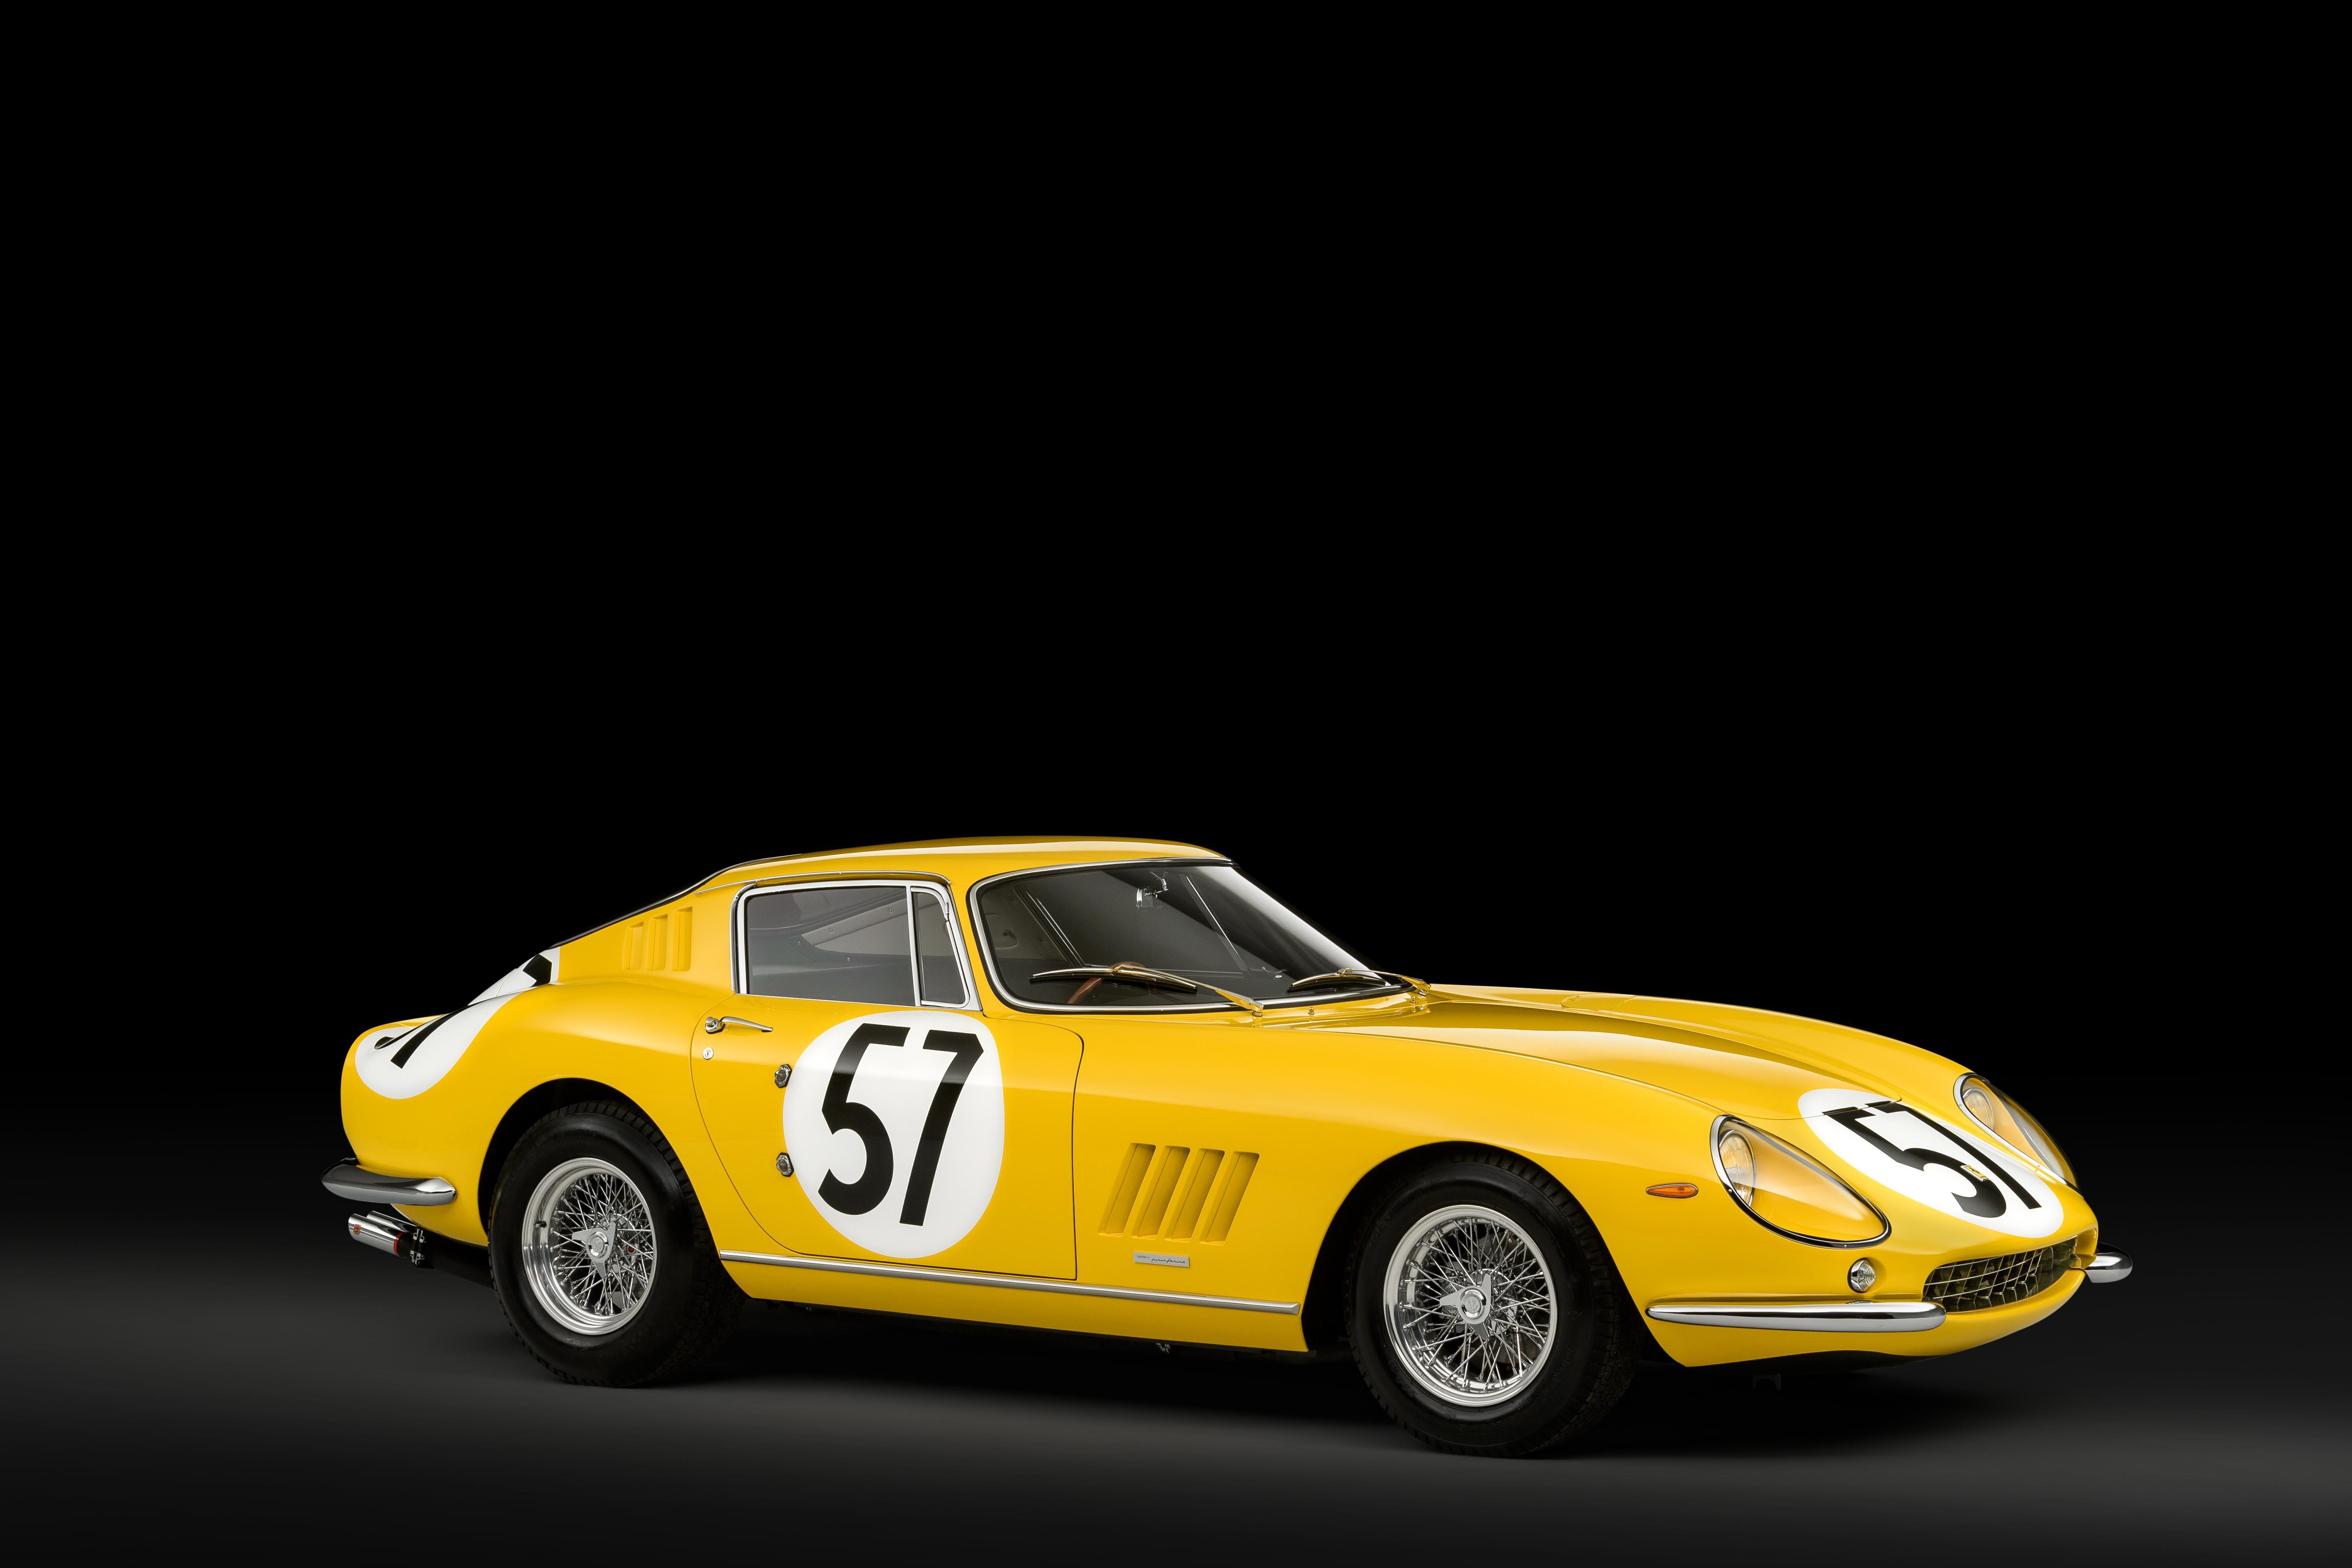 1966 Ferrari 275 Gtb C Vintage Car For Sale